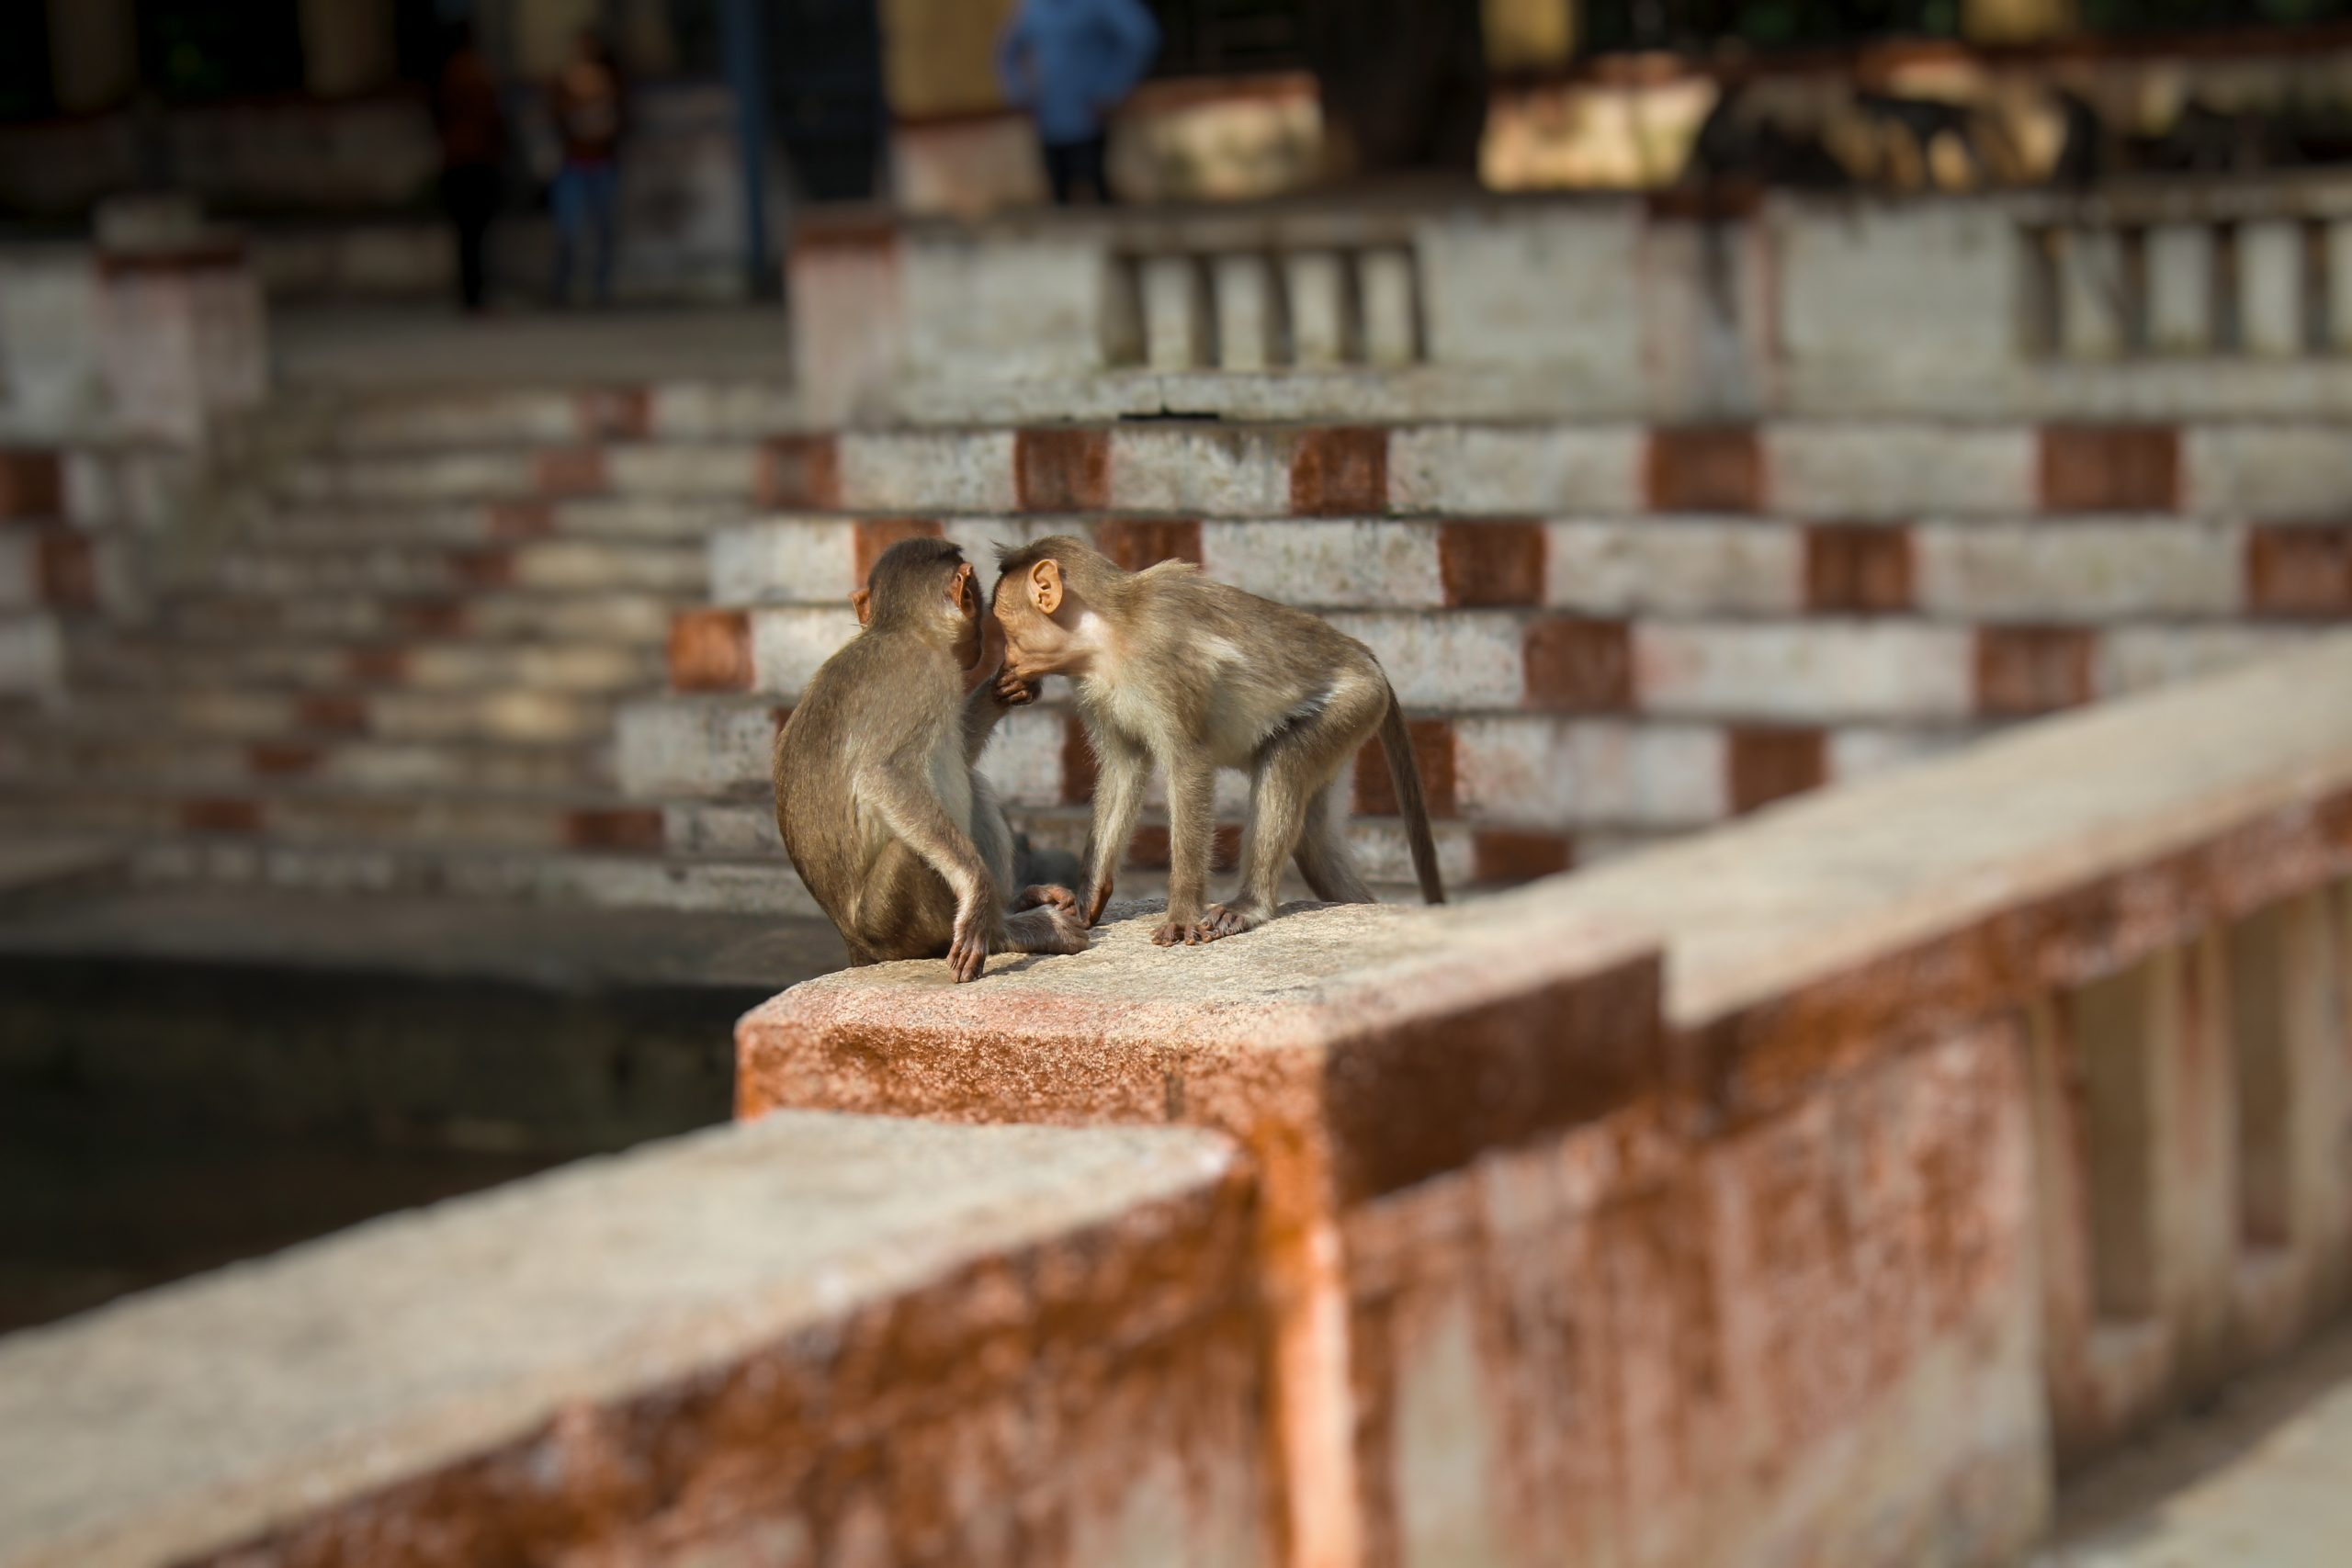 Baby monkeys on a railing